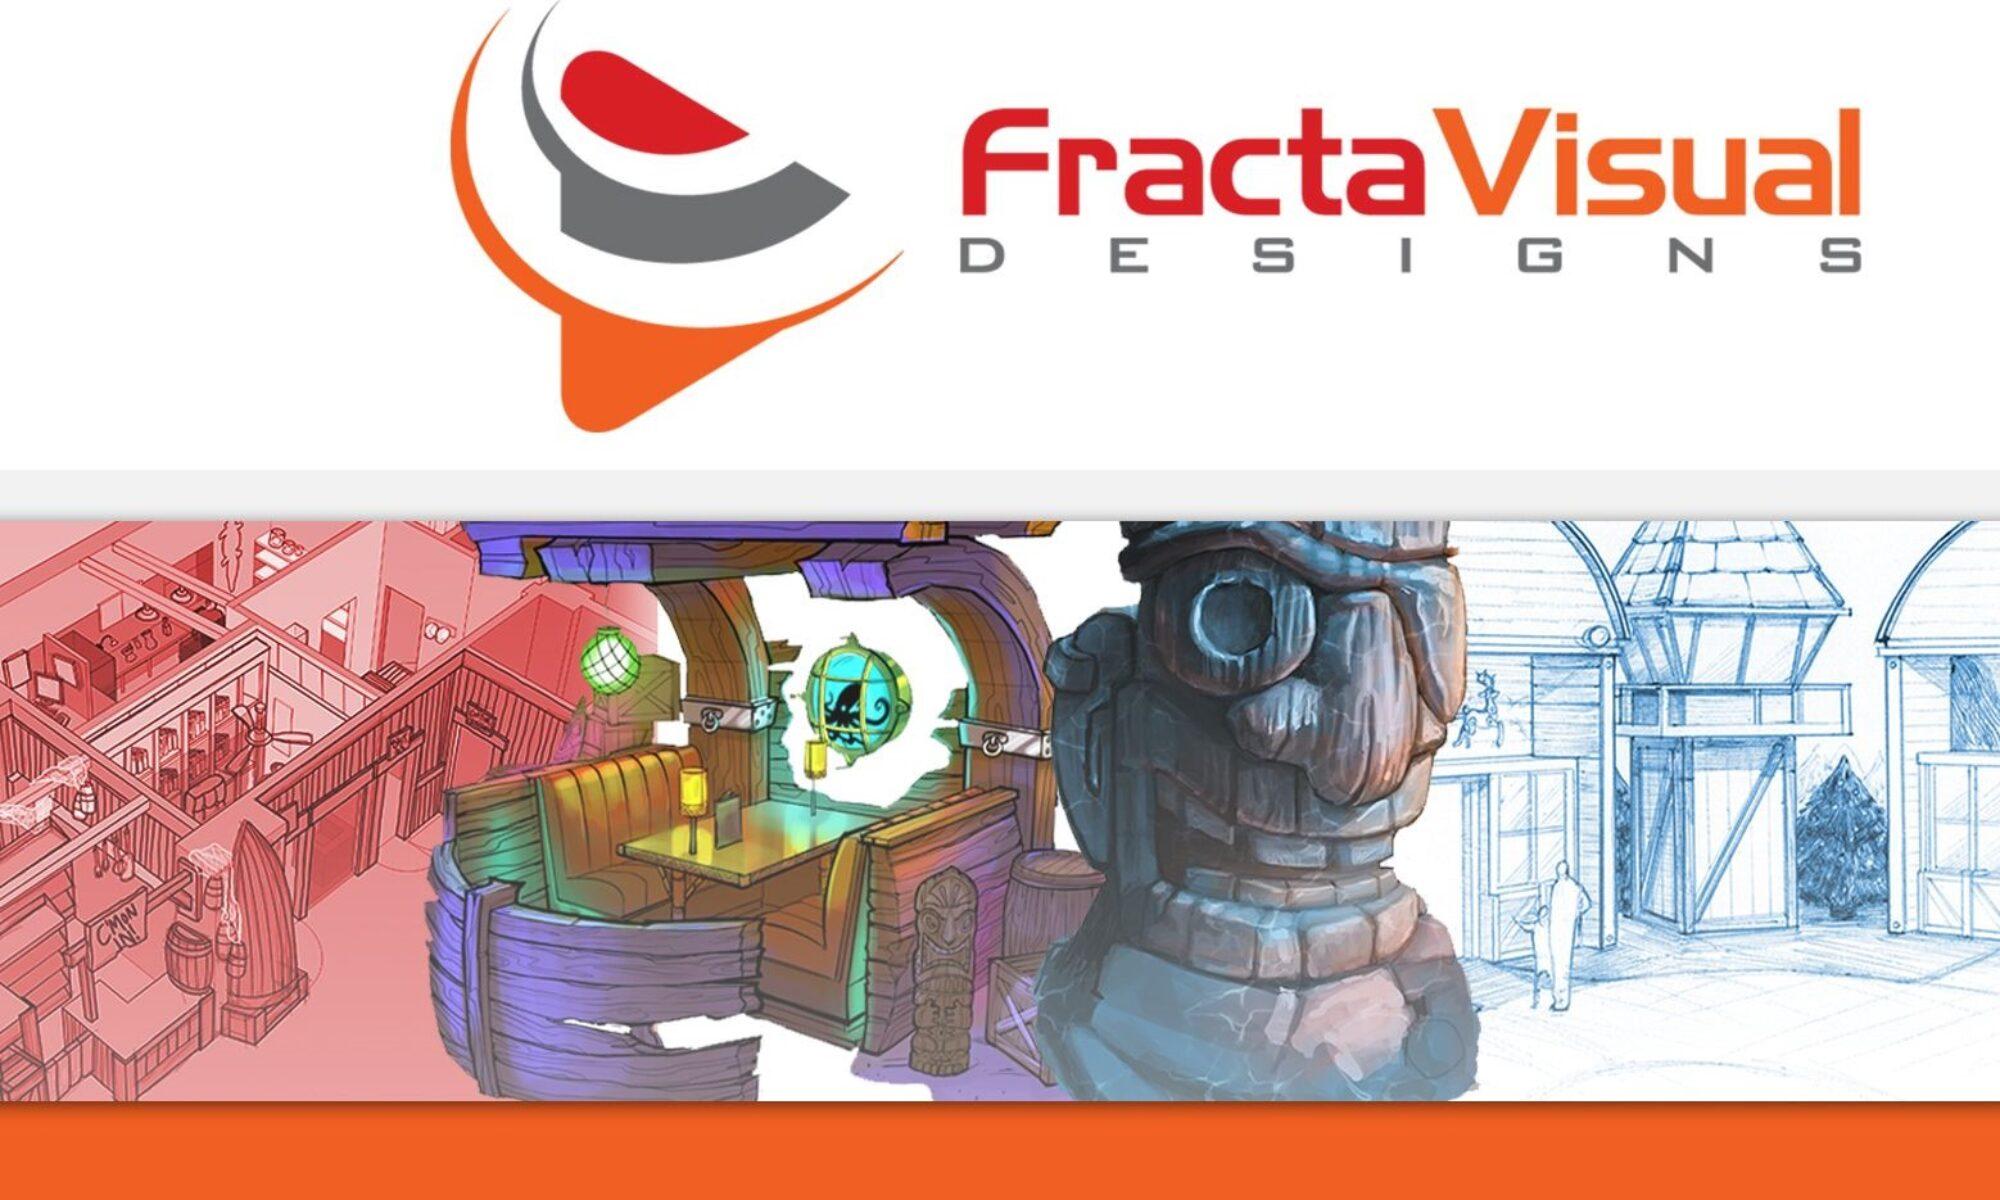 FractaVisual Designs